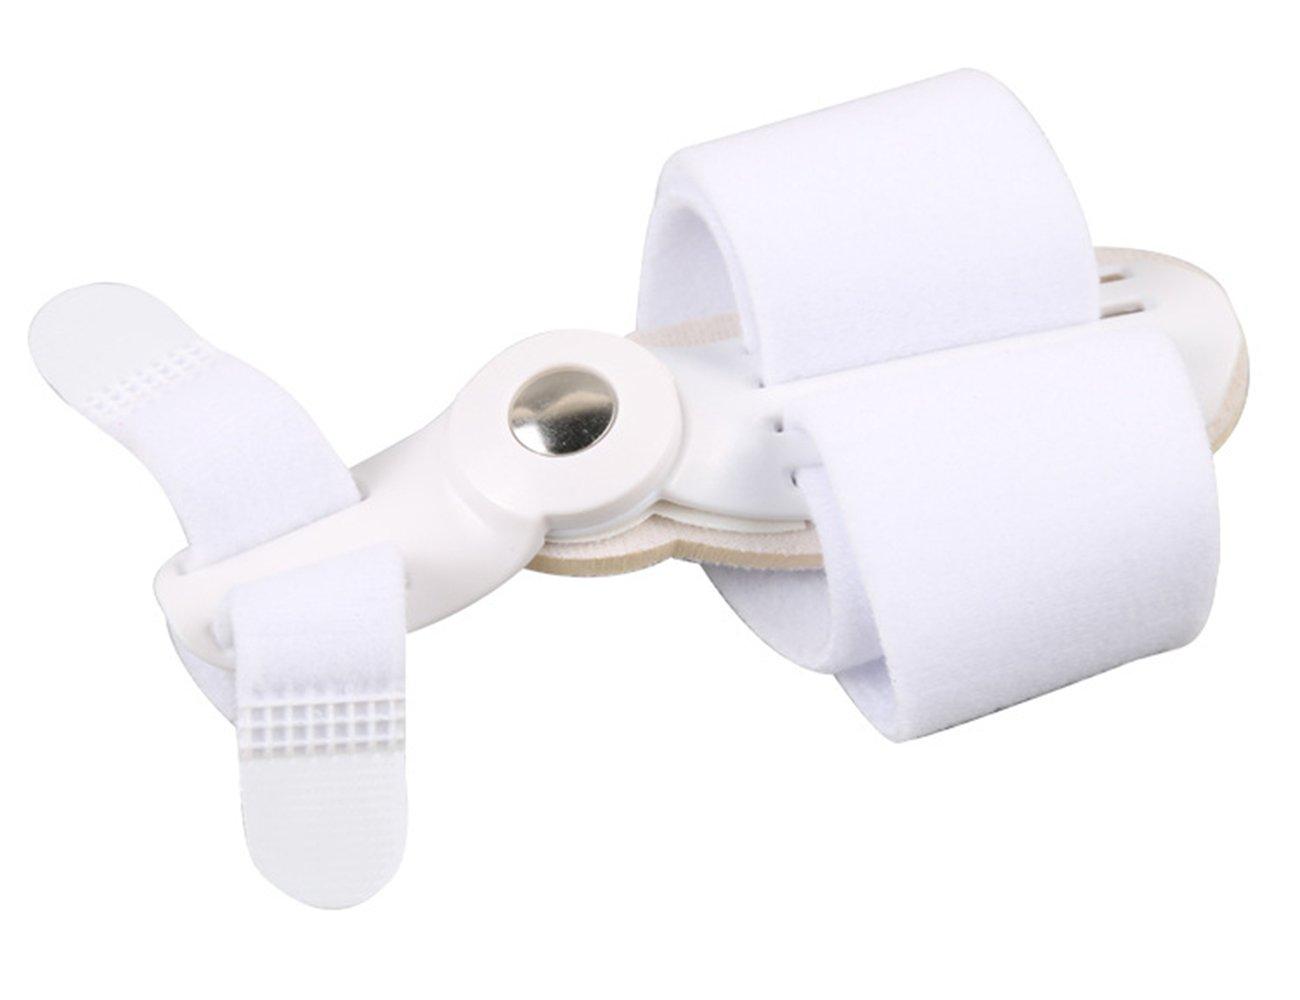 Foot Care Hallux Valgus Silicone Toe Separator And Corrector Daily-use Elitzia ETFT039